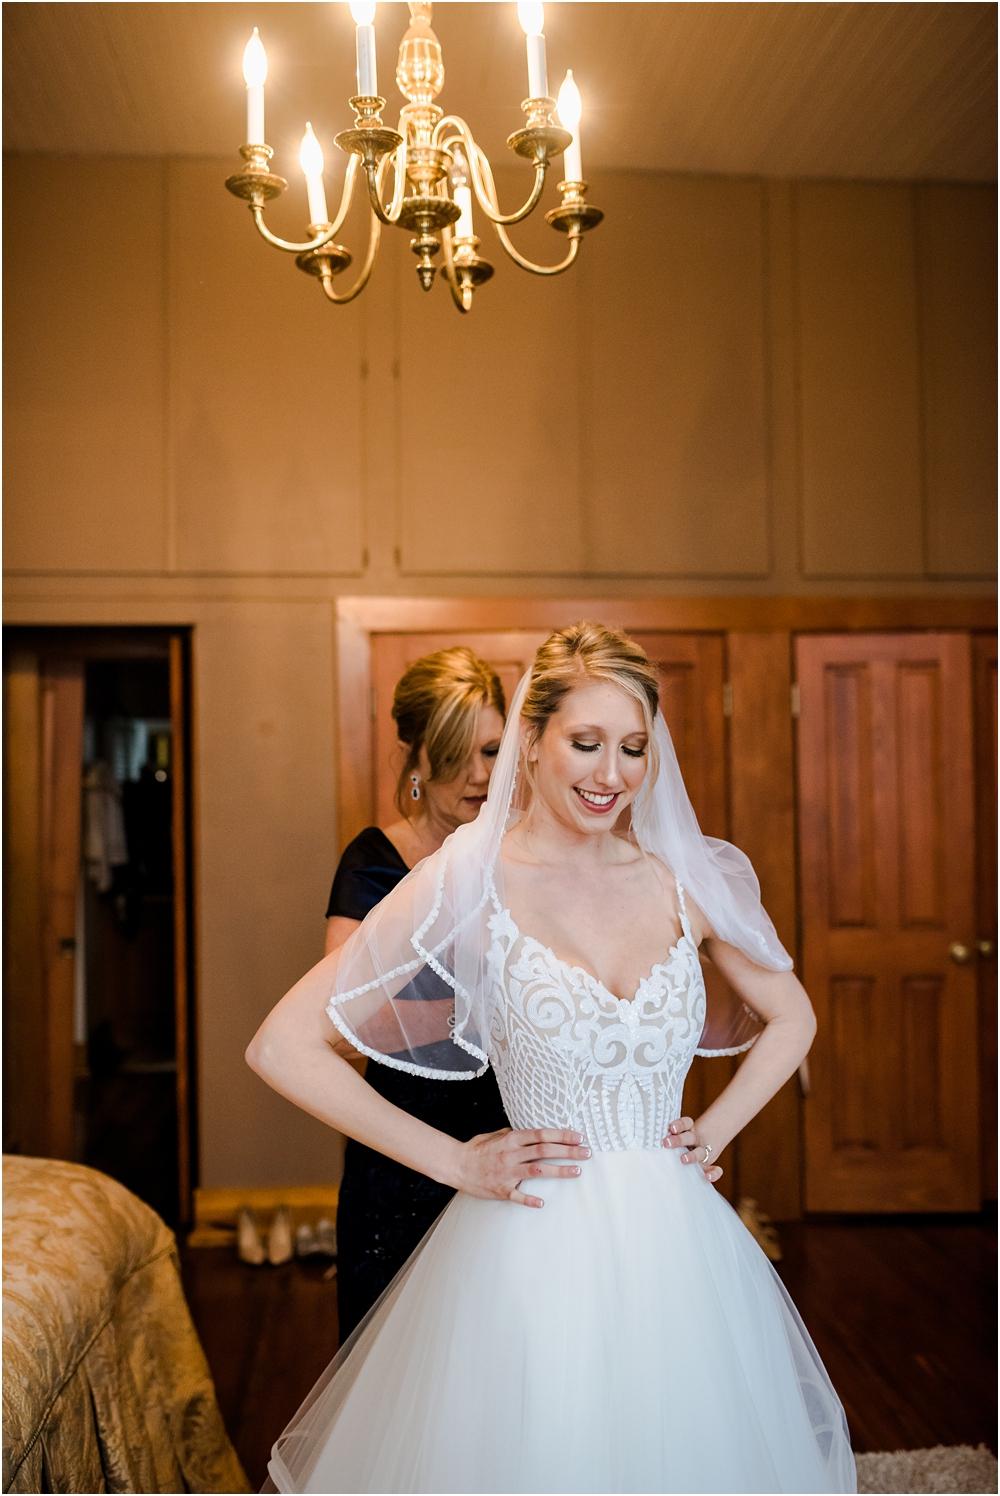 oconnor-pensacola-florida-wedding-photographer-kiersten-taylor-25.jpg